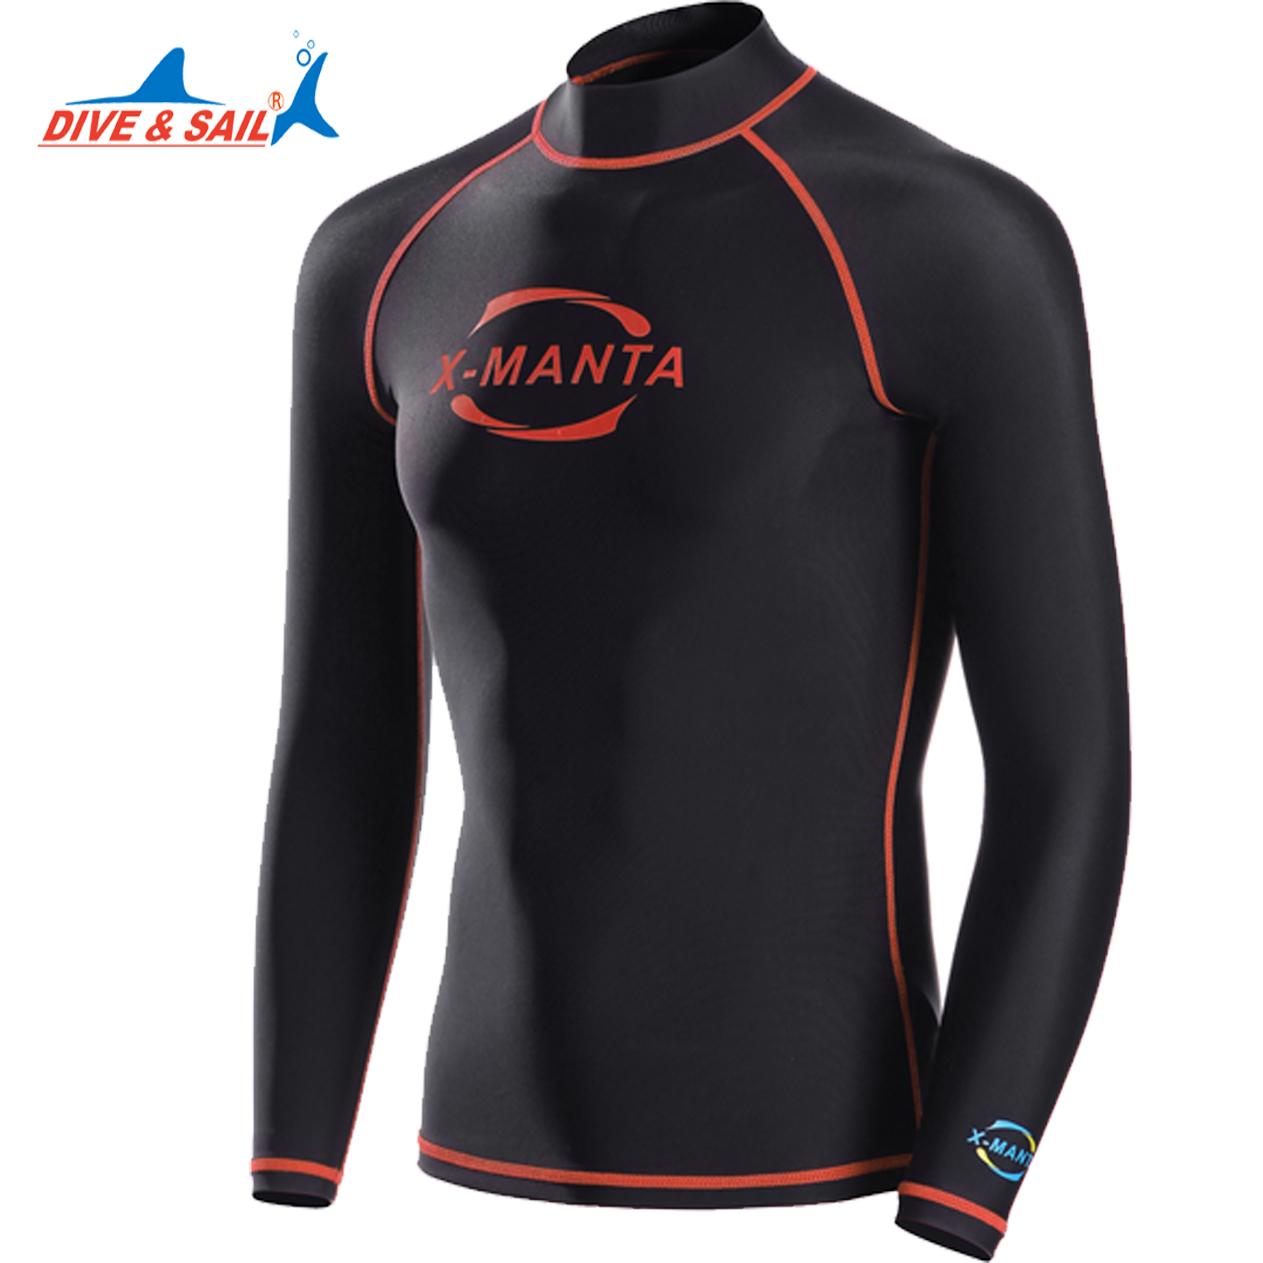 Dive Sail Lycra Upf 50 Long Sleeve Rash Guards Shirts For